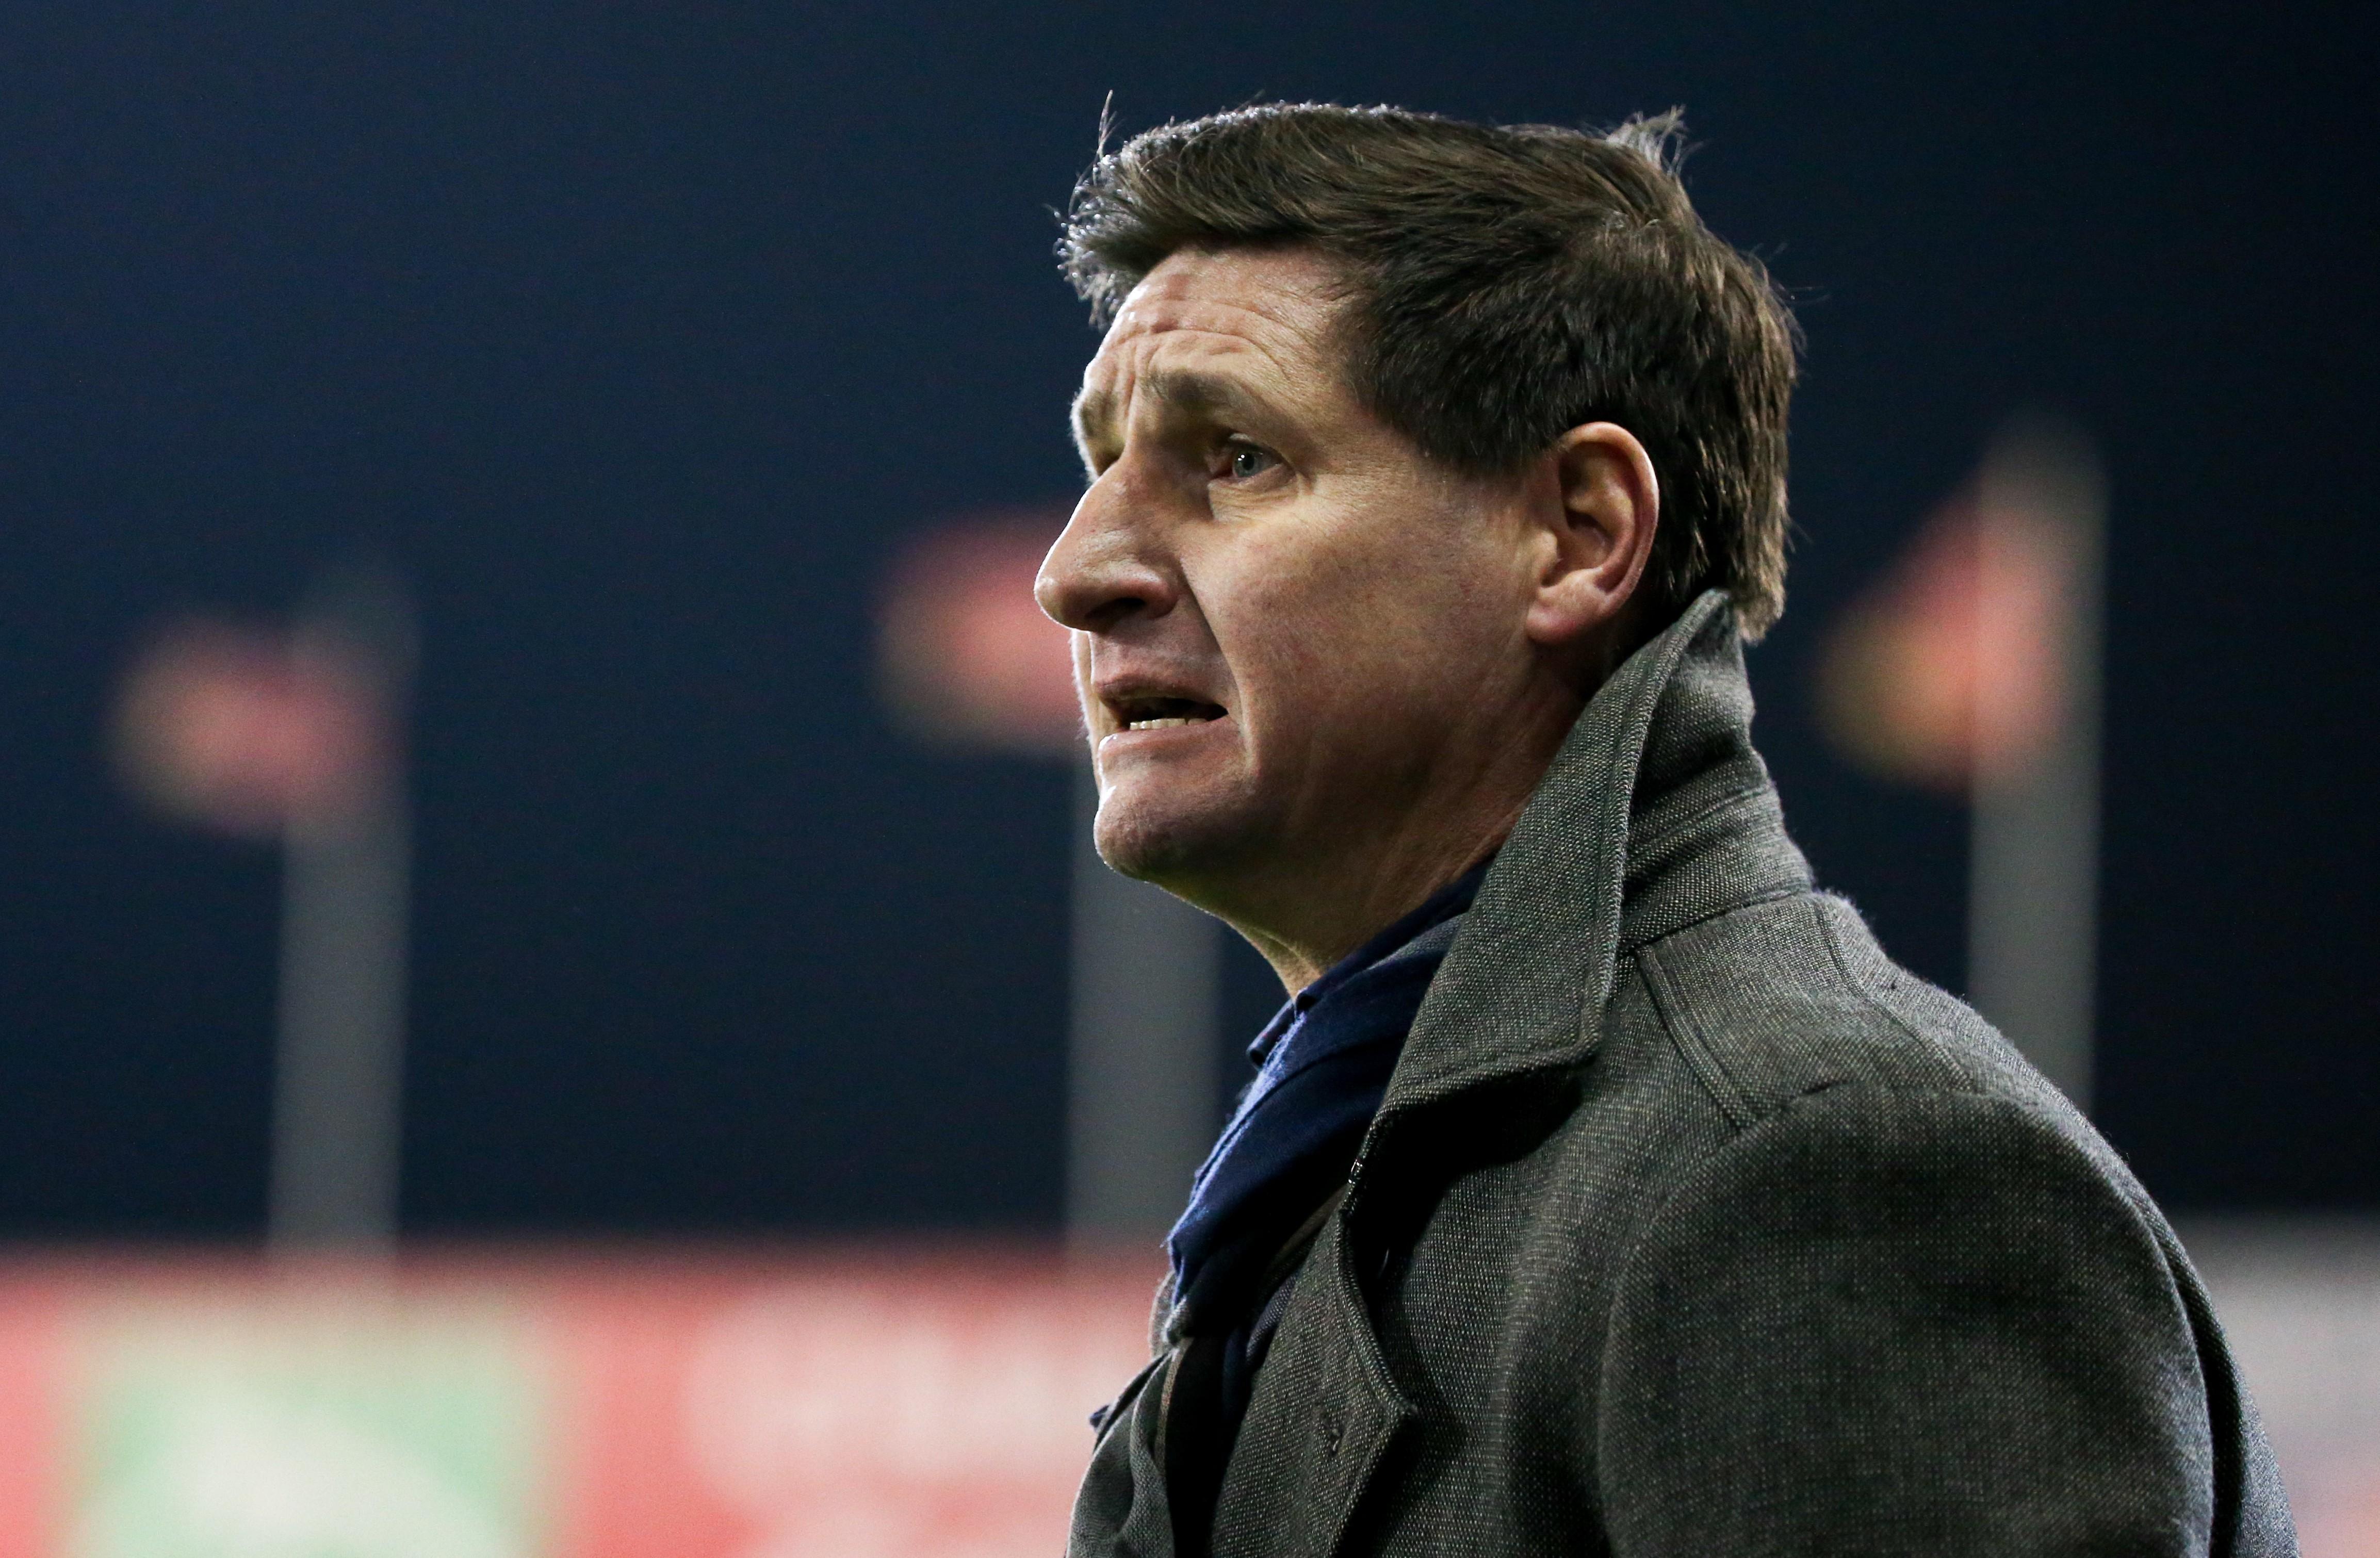 Mouscron craque en fin de match contre Gand (2-0)